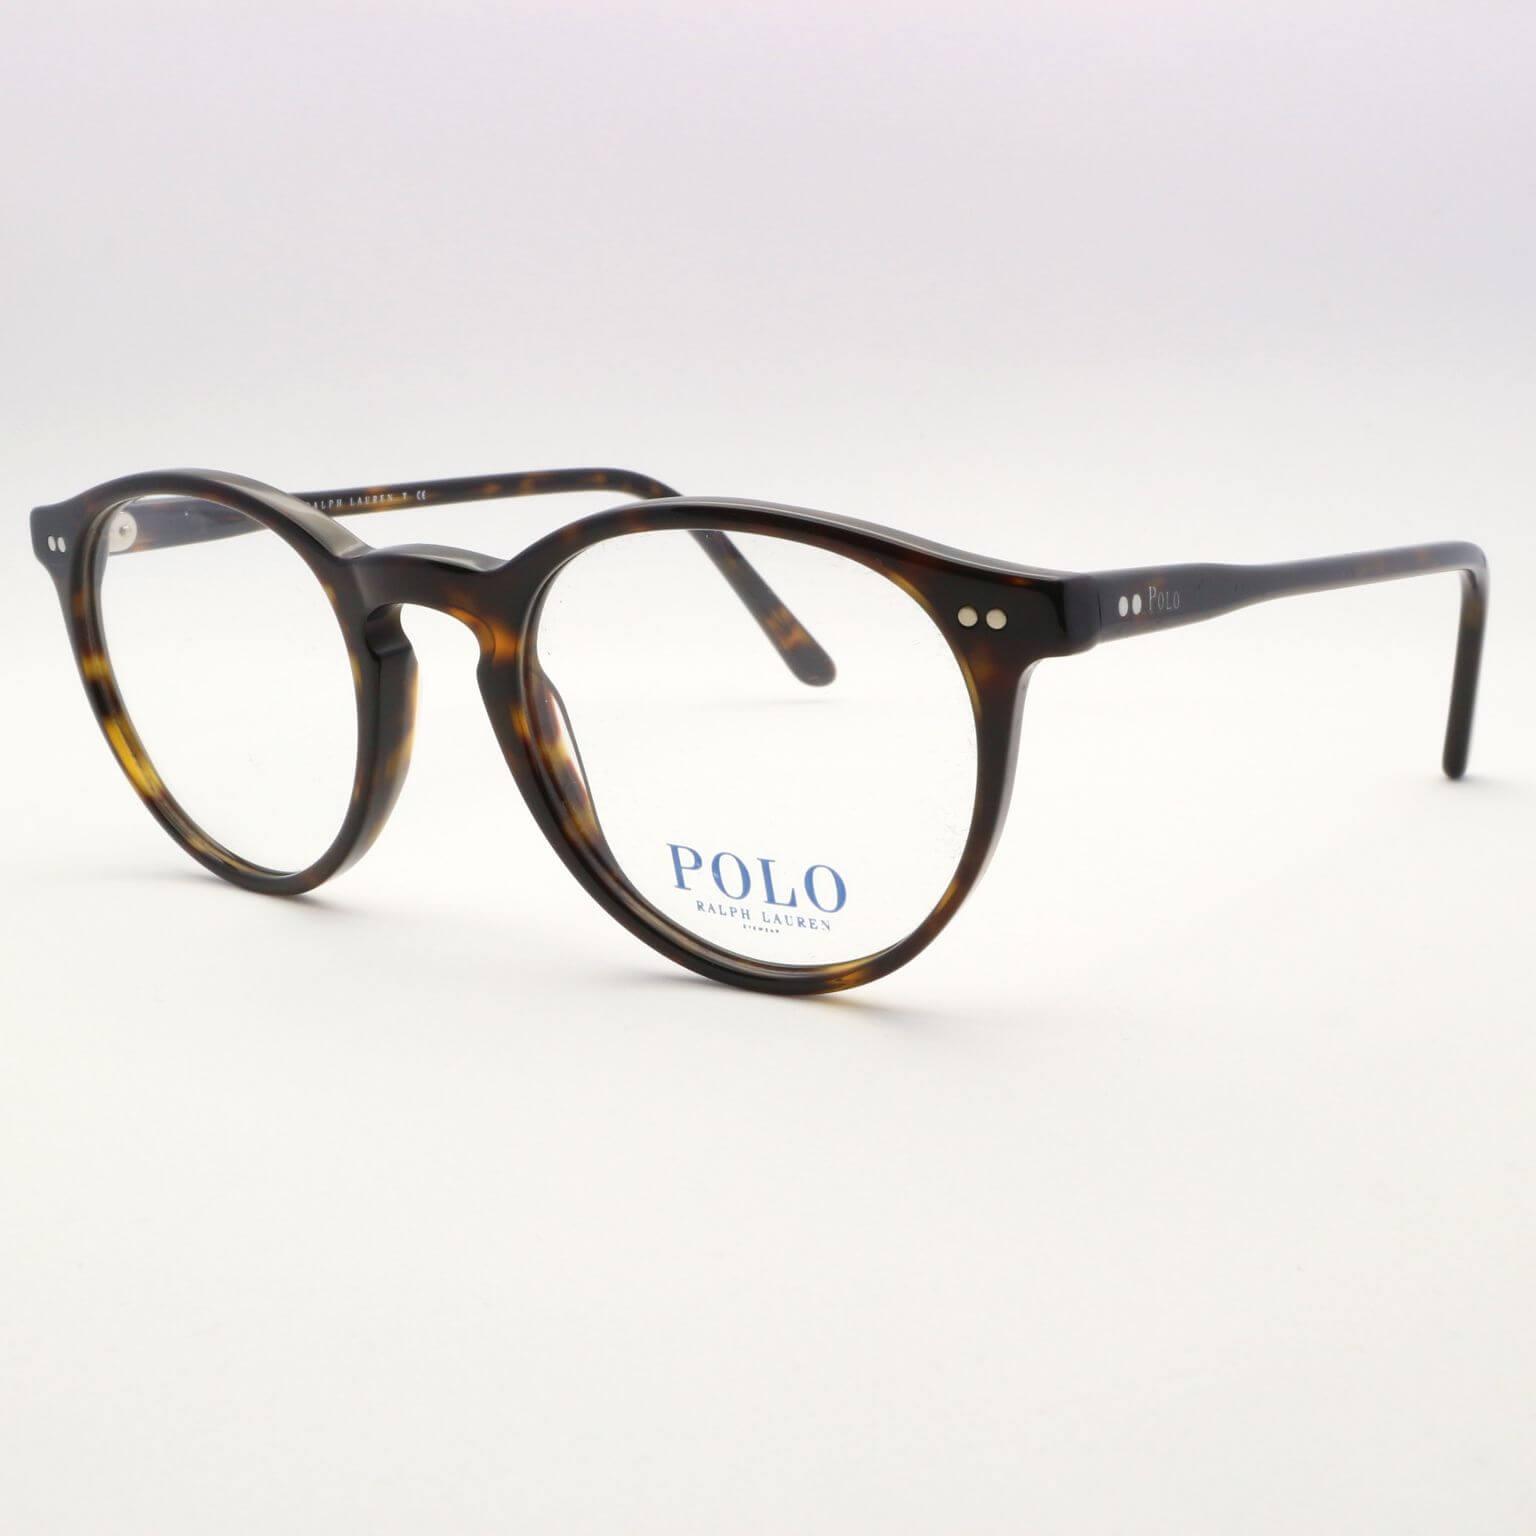 Polo Ralph Lauren 2083 5003 48 ~ Eyelab db016bfc85d